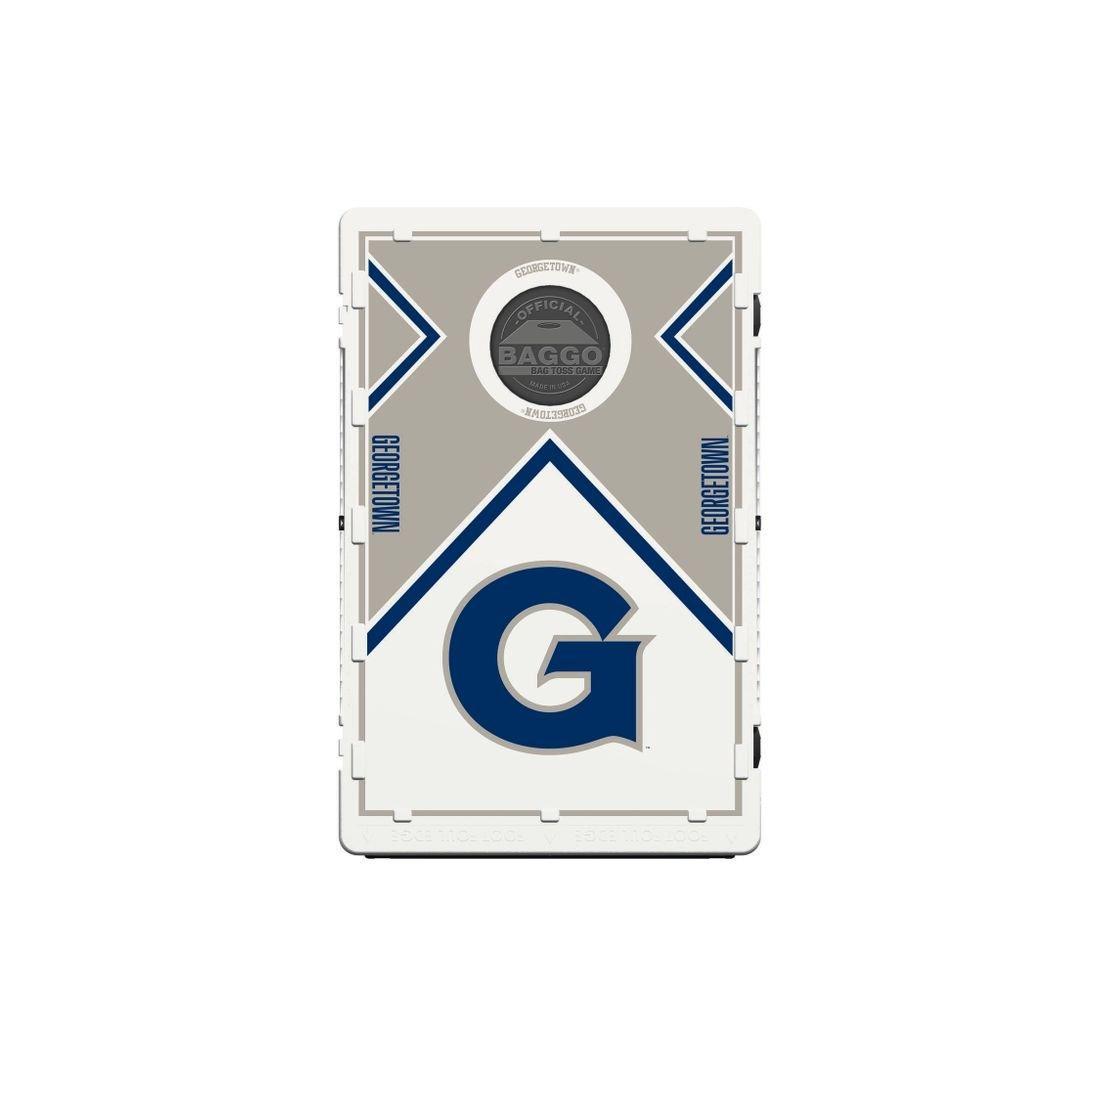 Georgetown Hoyas Baggo Bean Bag Toss Cornhole Game Vintage Design